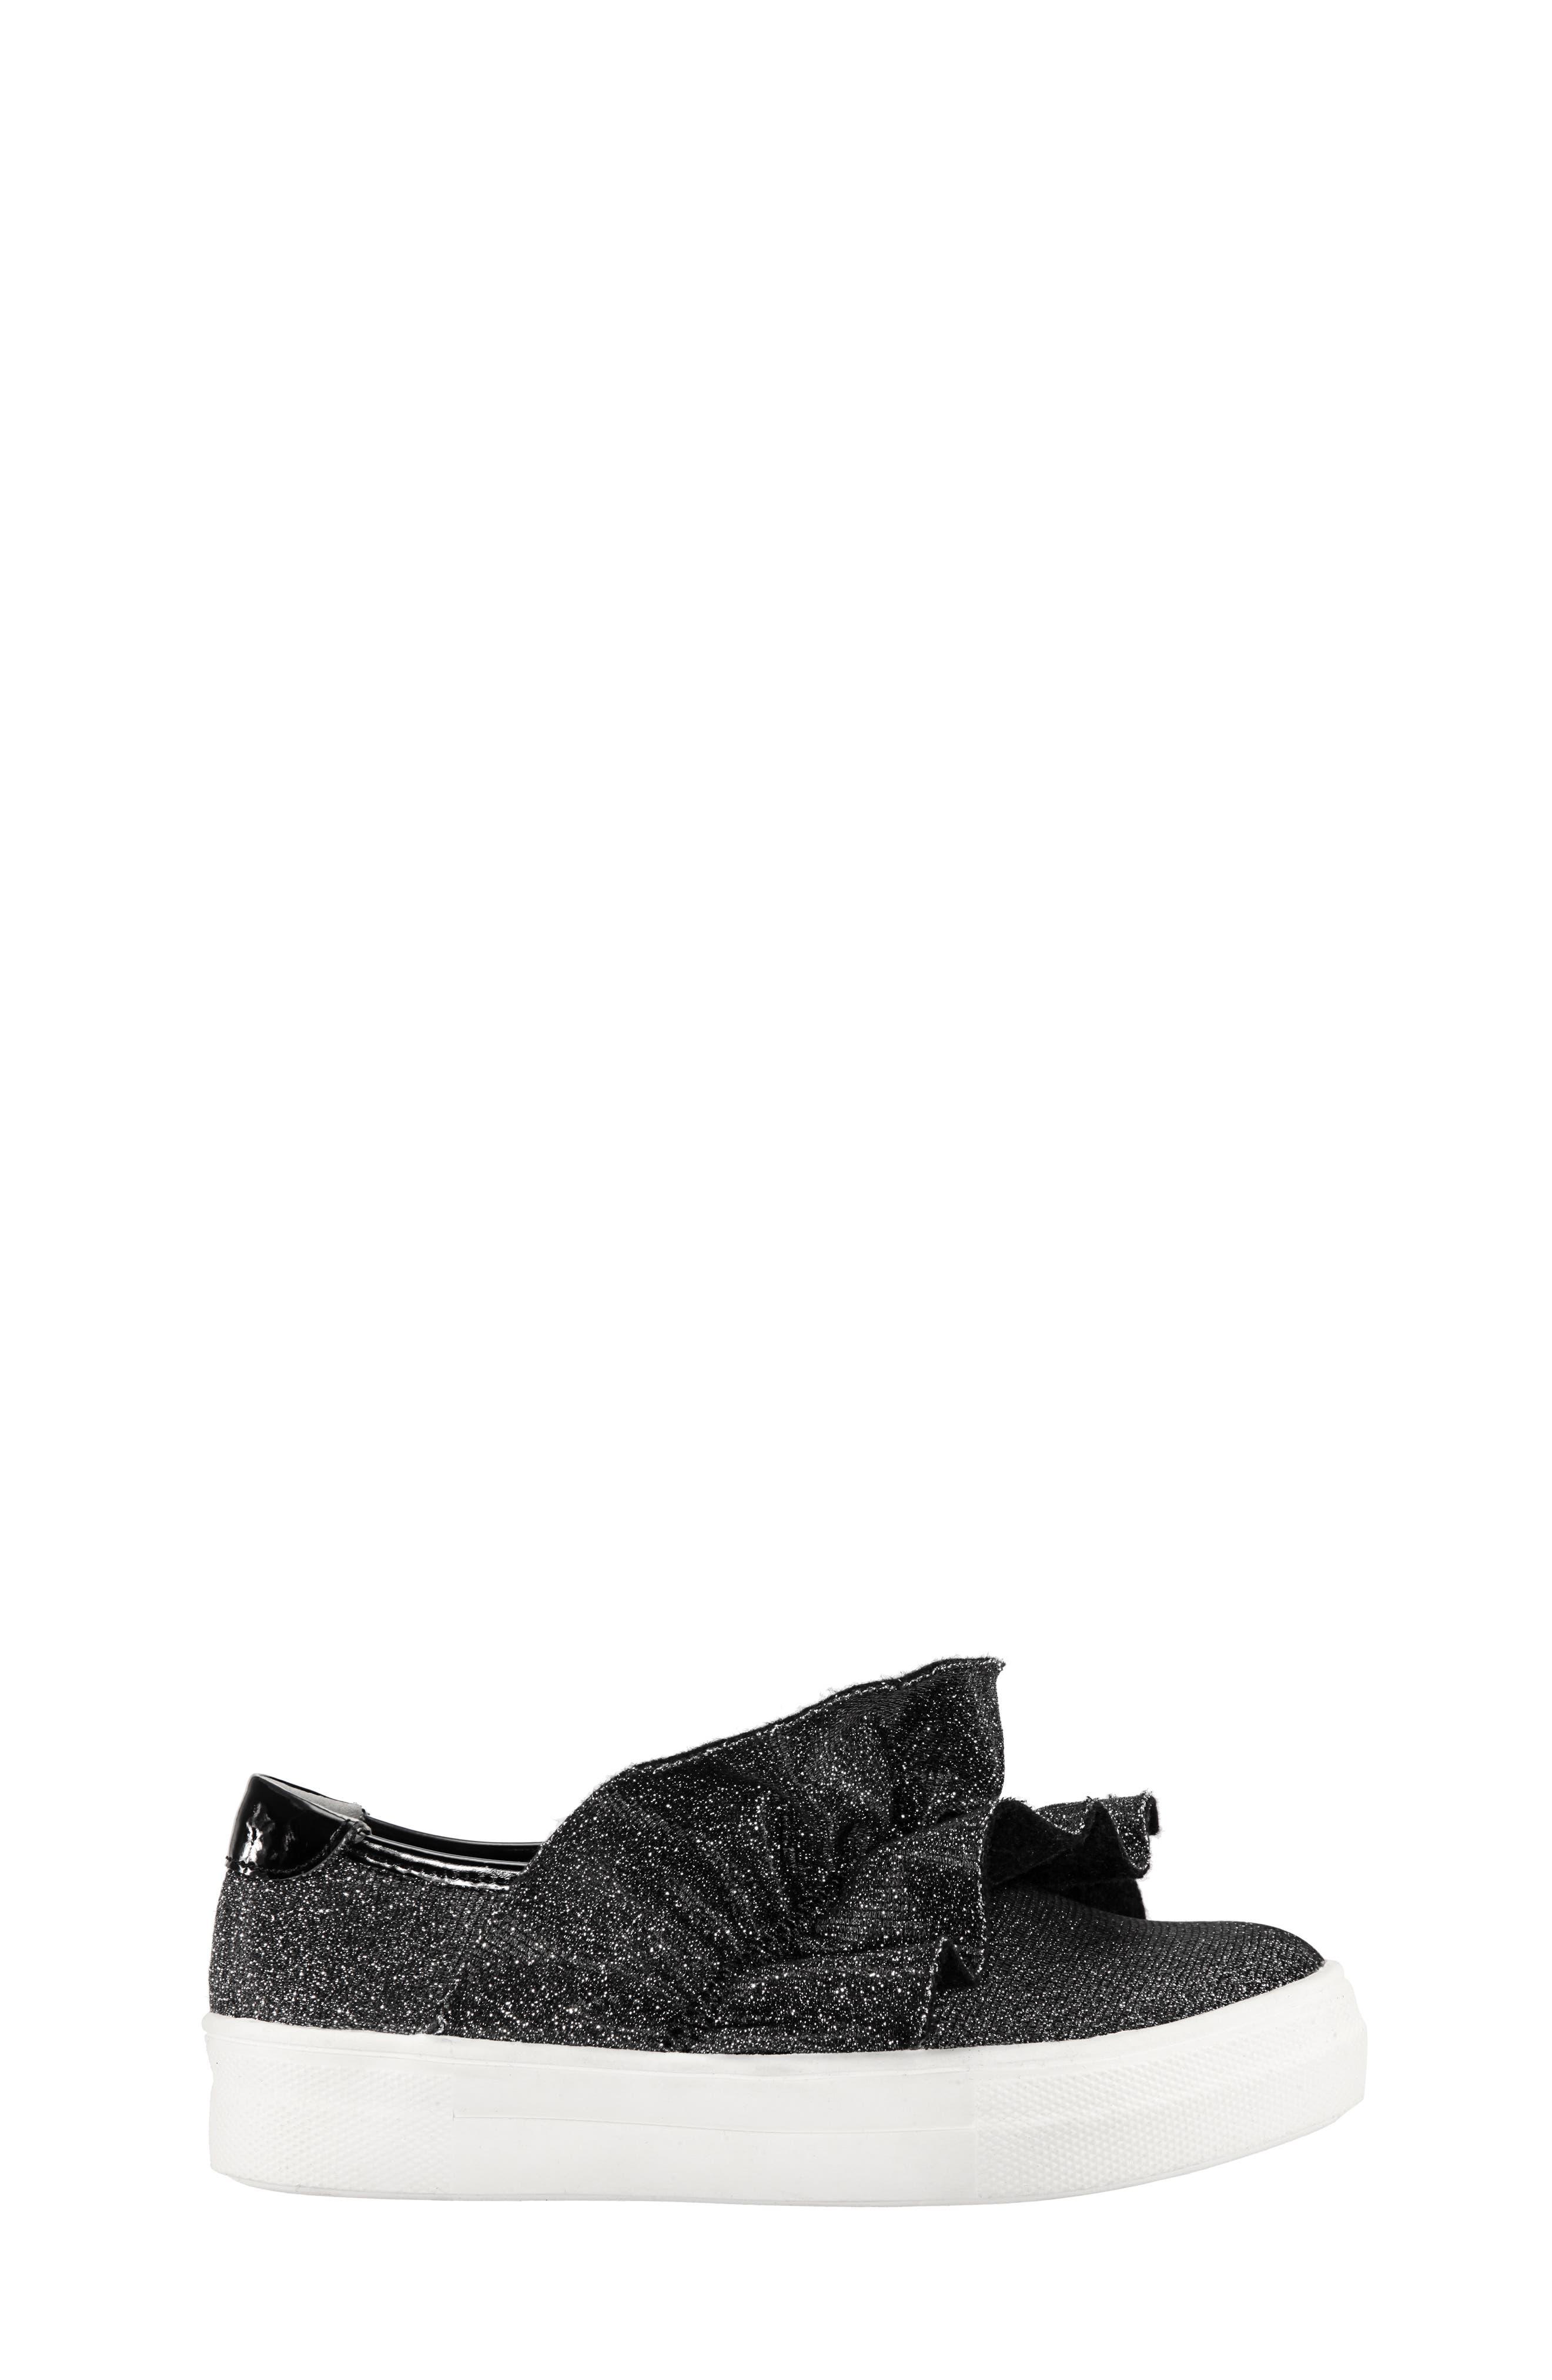 Ivani Slip-On Sneaker,                             Alternate thumbnail 3, color,                             BLACK SPARKLE FABRIC